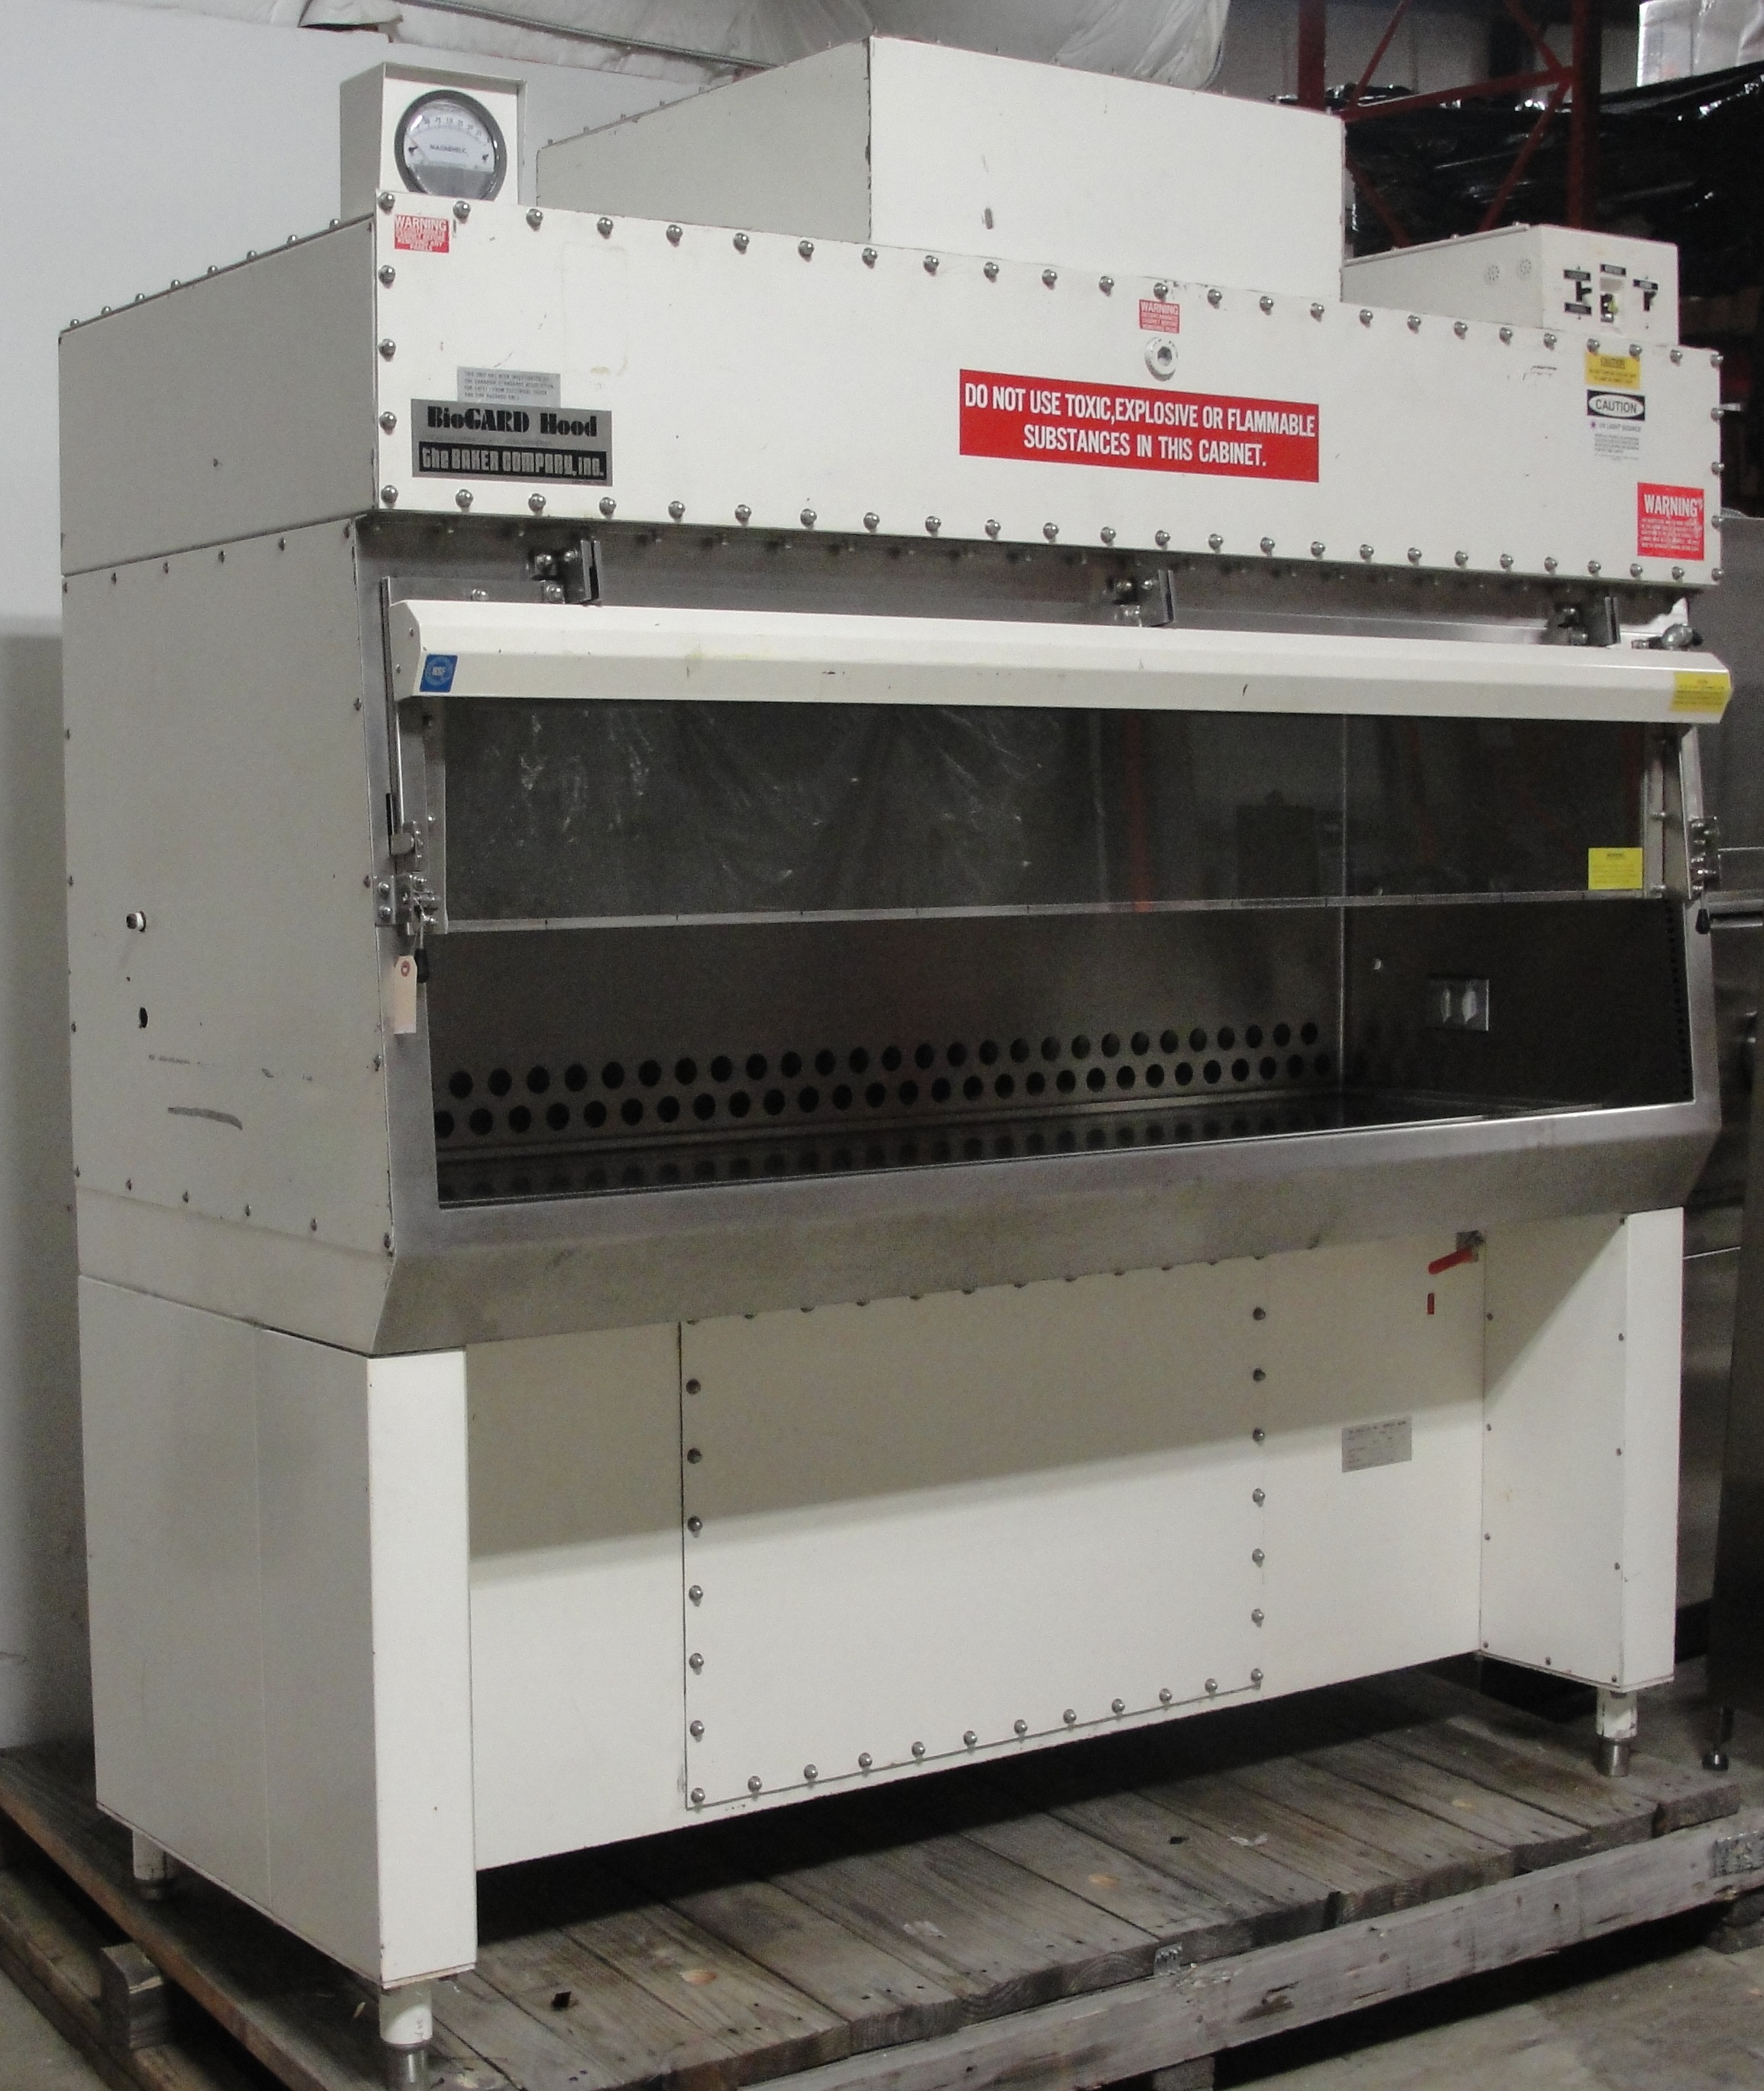 Refurbished Baker Company Model B60 112 Biogard Class Ii